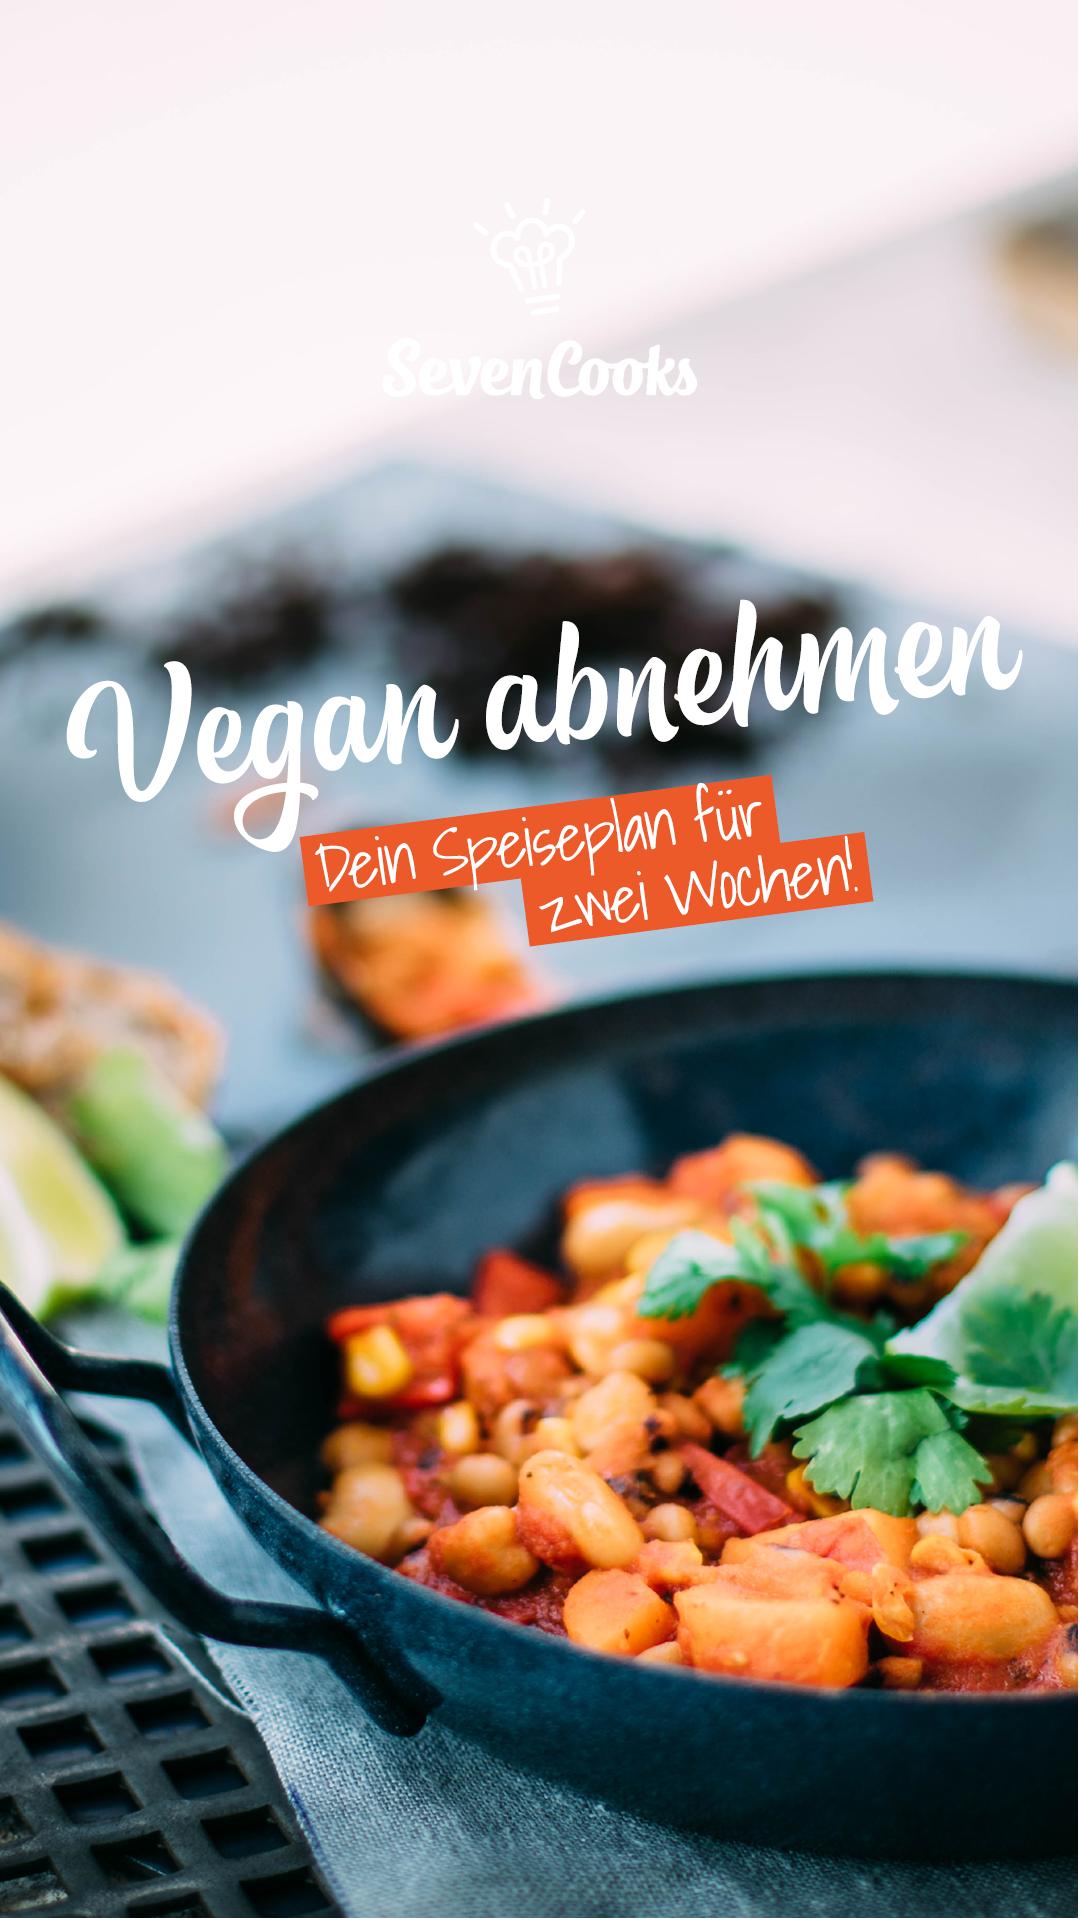 Vegan Abnehmen So Geht S Richtig Sevencooks Vegan Abnehmen Vegane Lebensmittel Vegane Rezepte Abnehmen